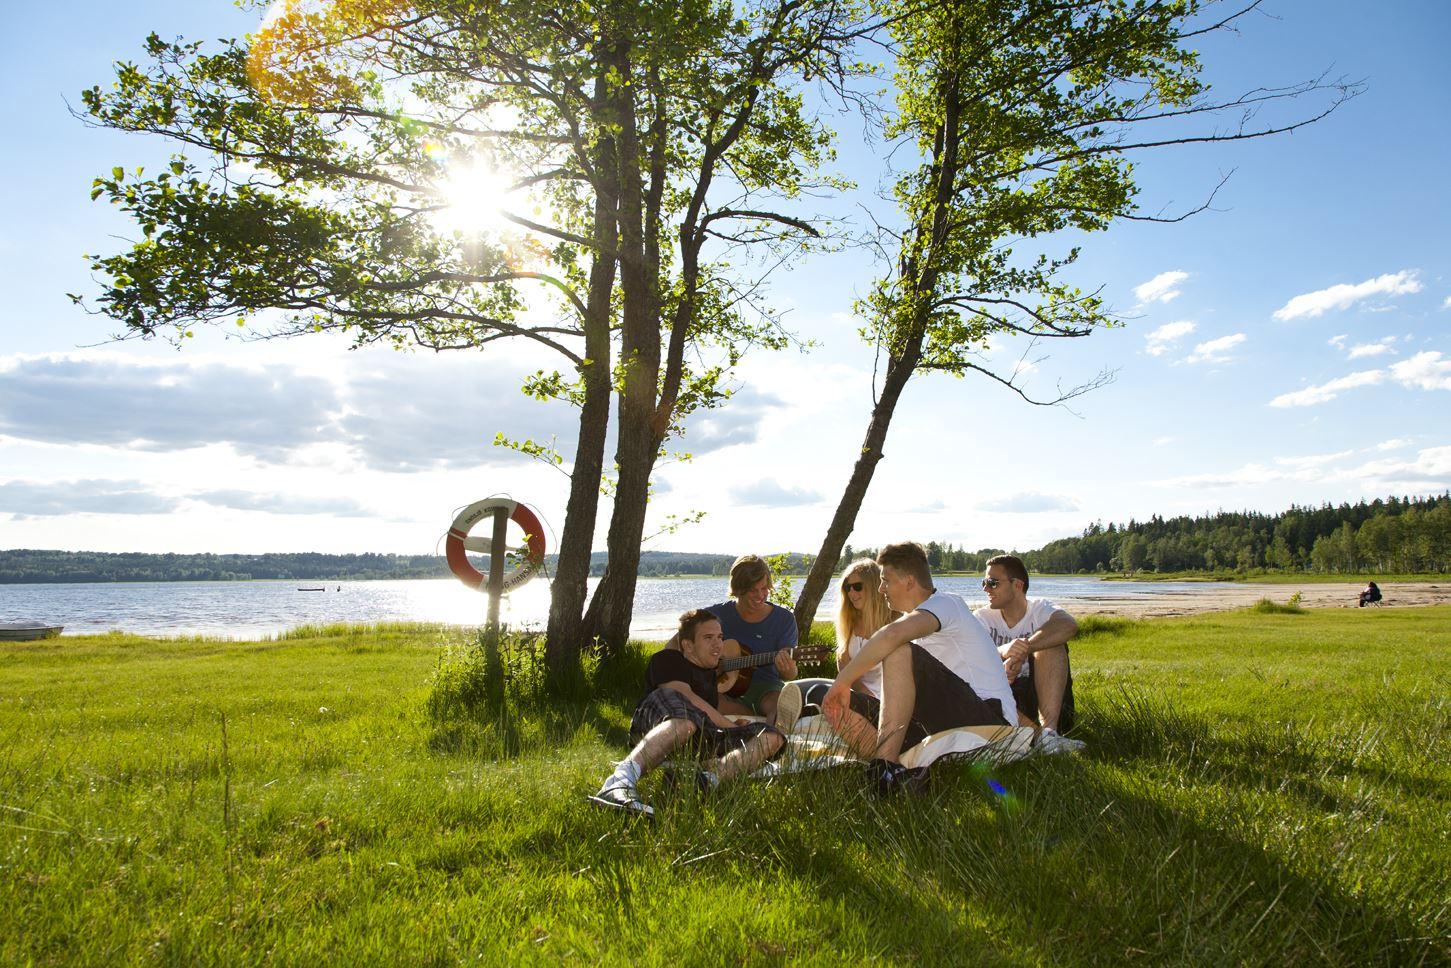 Flatenbadets Stugor & Camping - Cabbins & Campsite